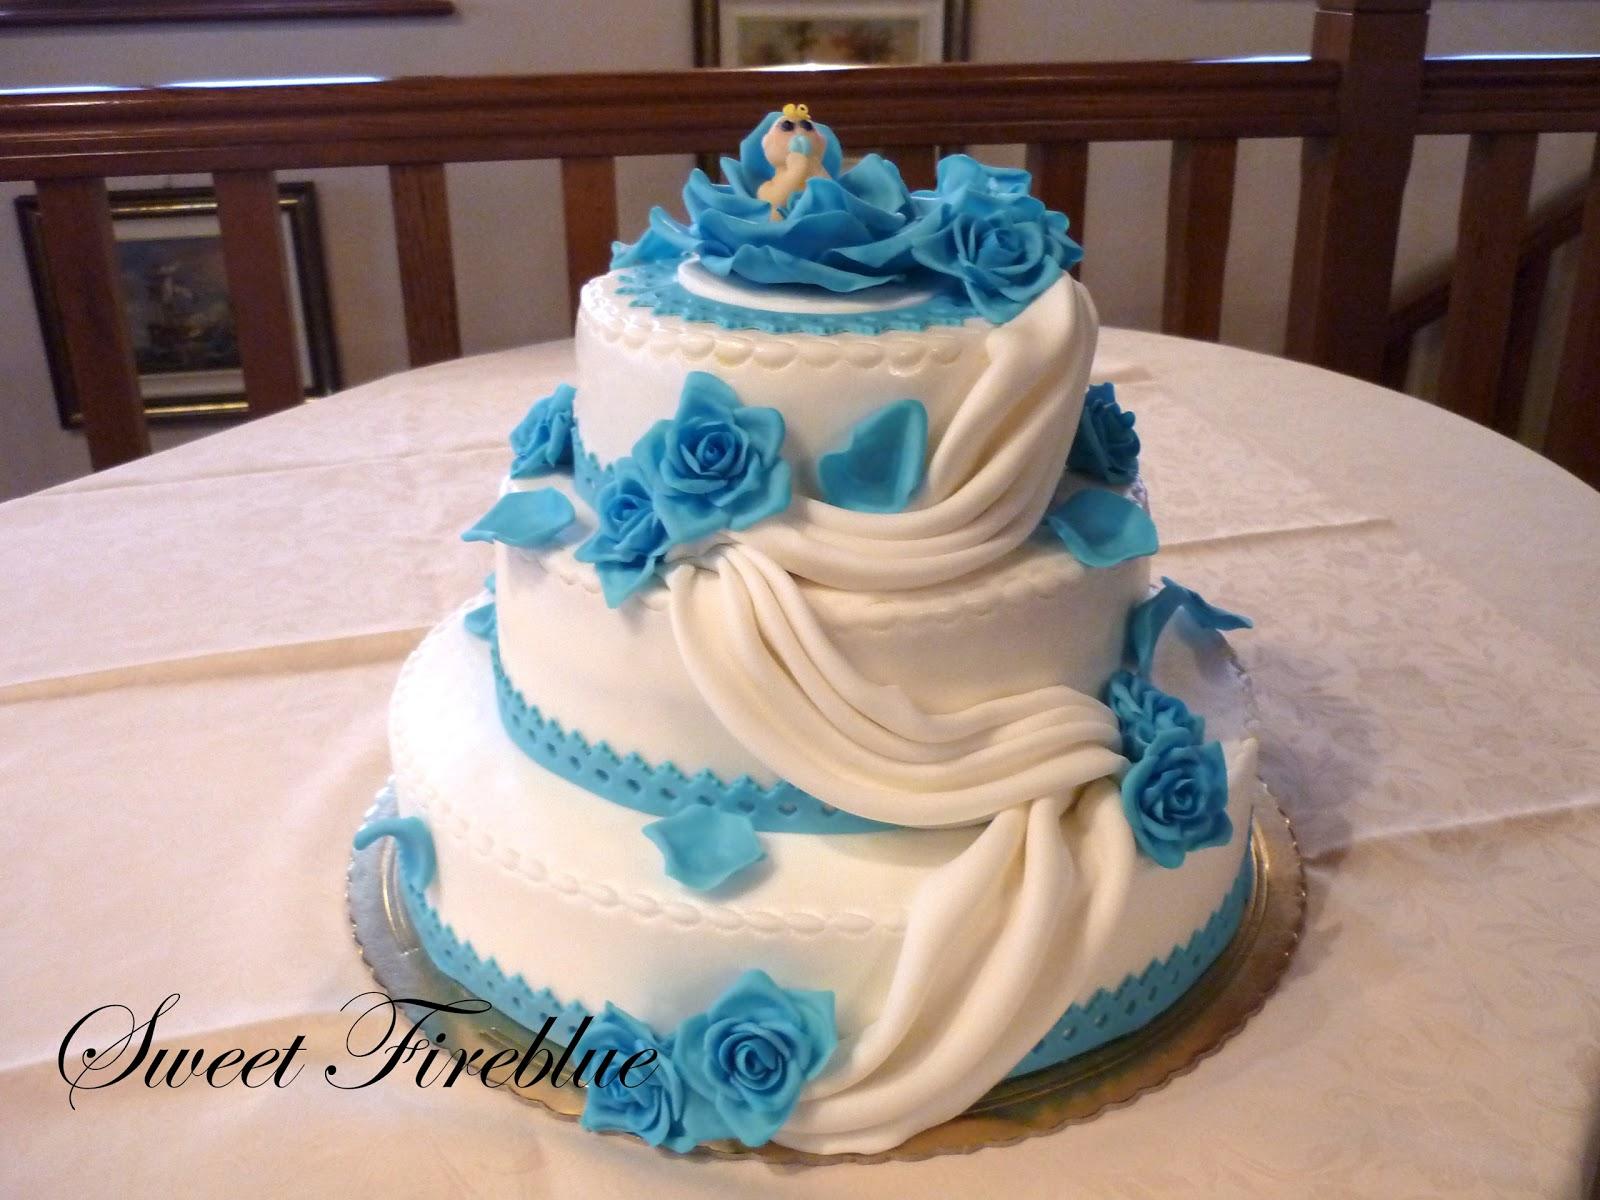 Favorito Sweet Fireblue: Torta battesimo + confetti decorati! NK56